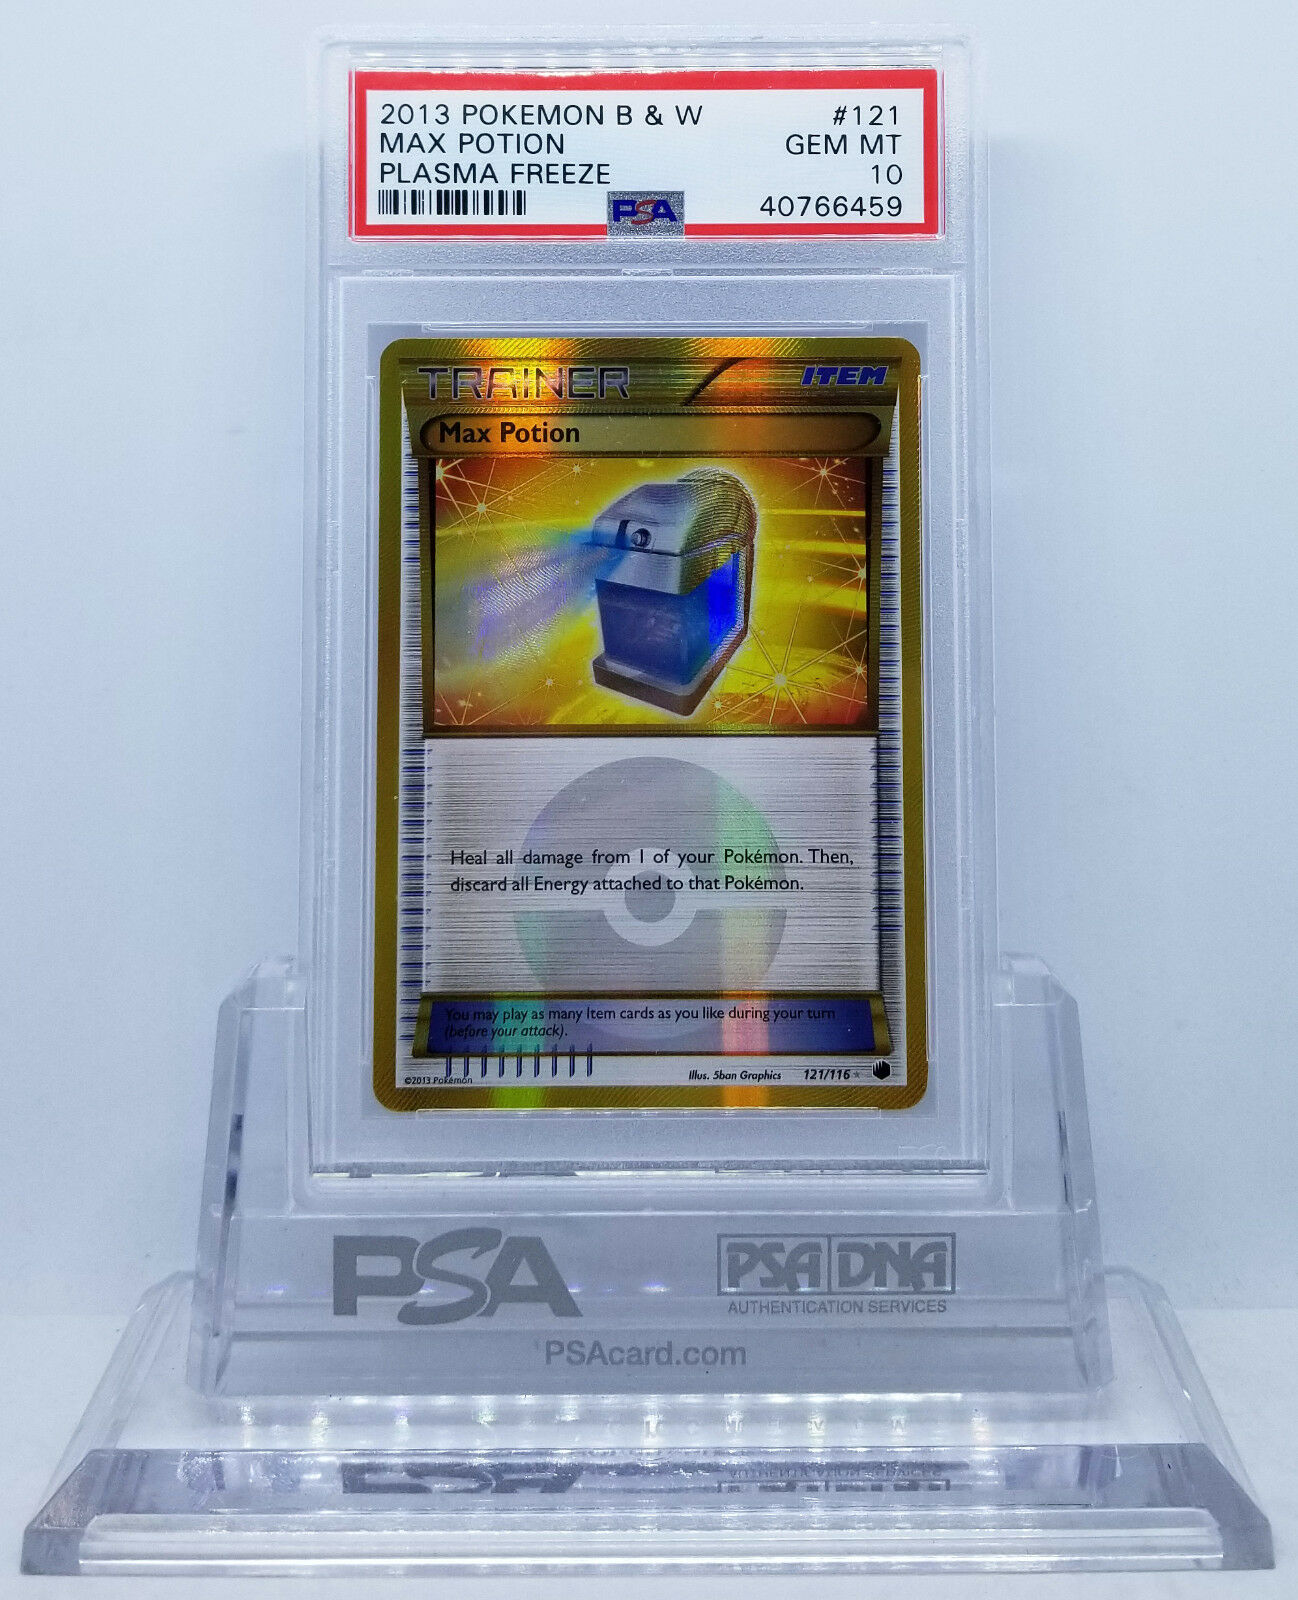 Pokemon plasma friedze Max pontion   116 holograma CAPSA PSA 10 gemas y menta 35, 23 de agosto